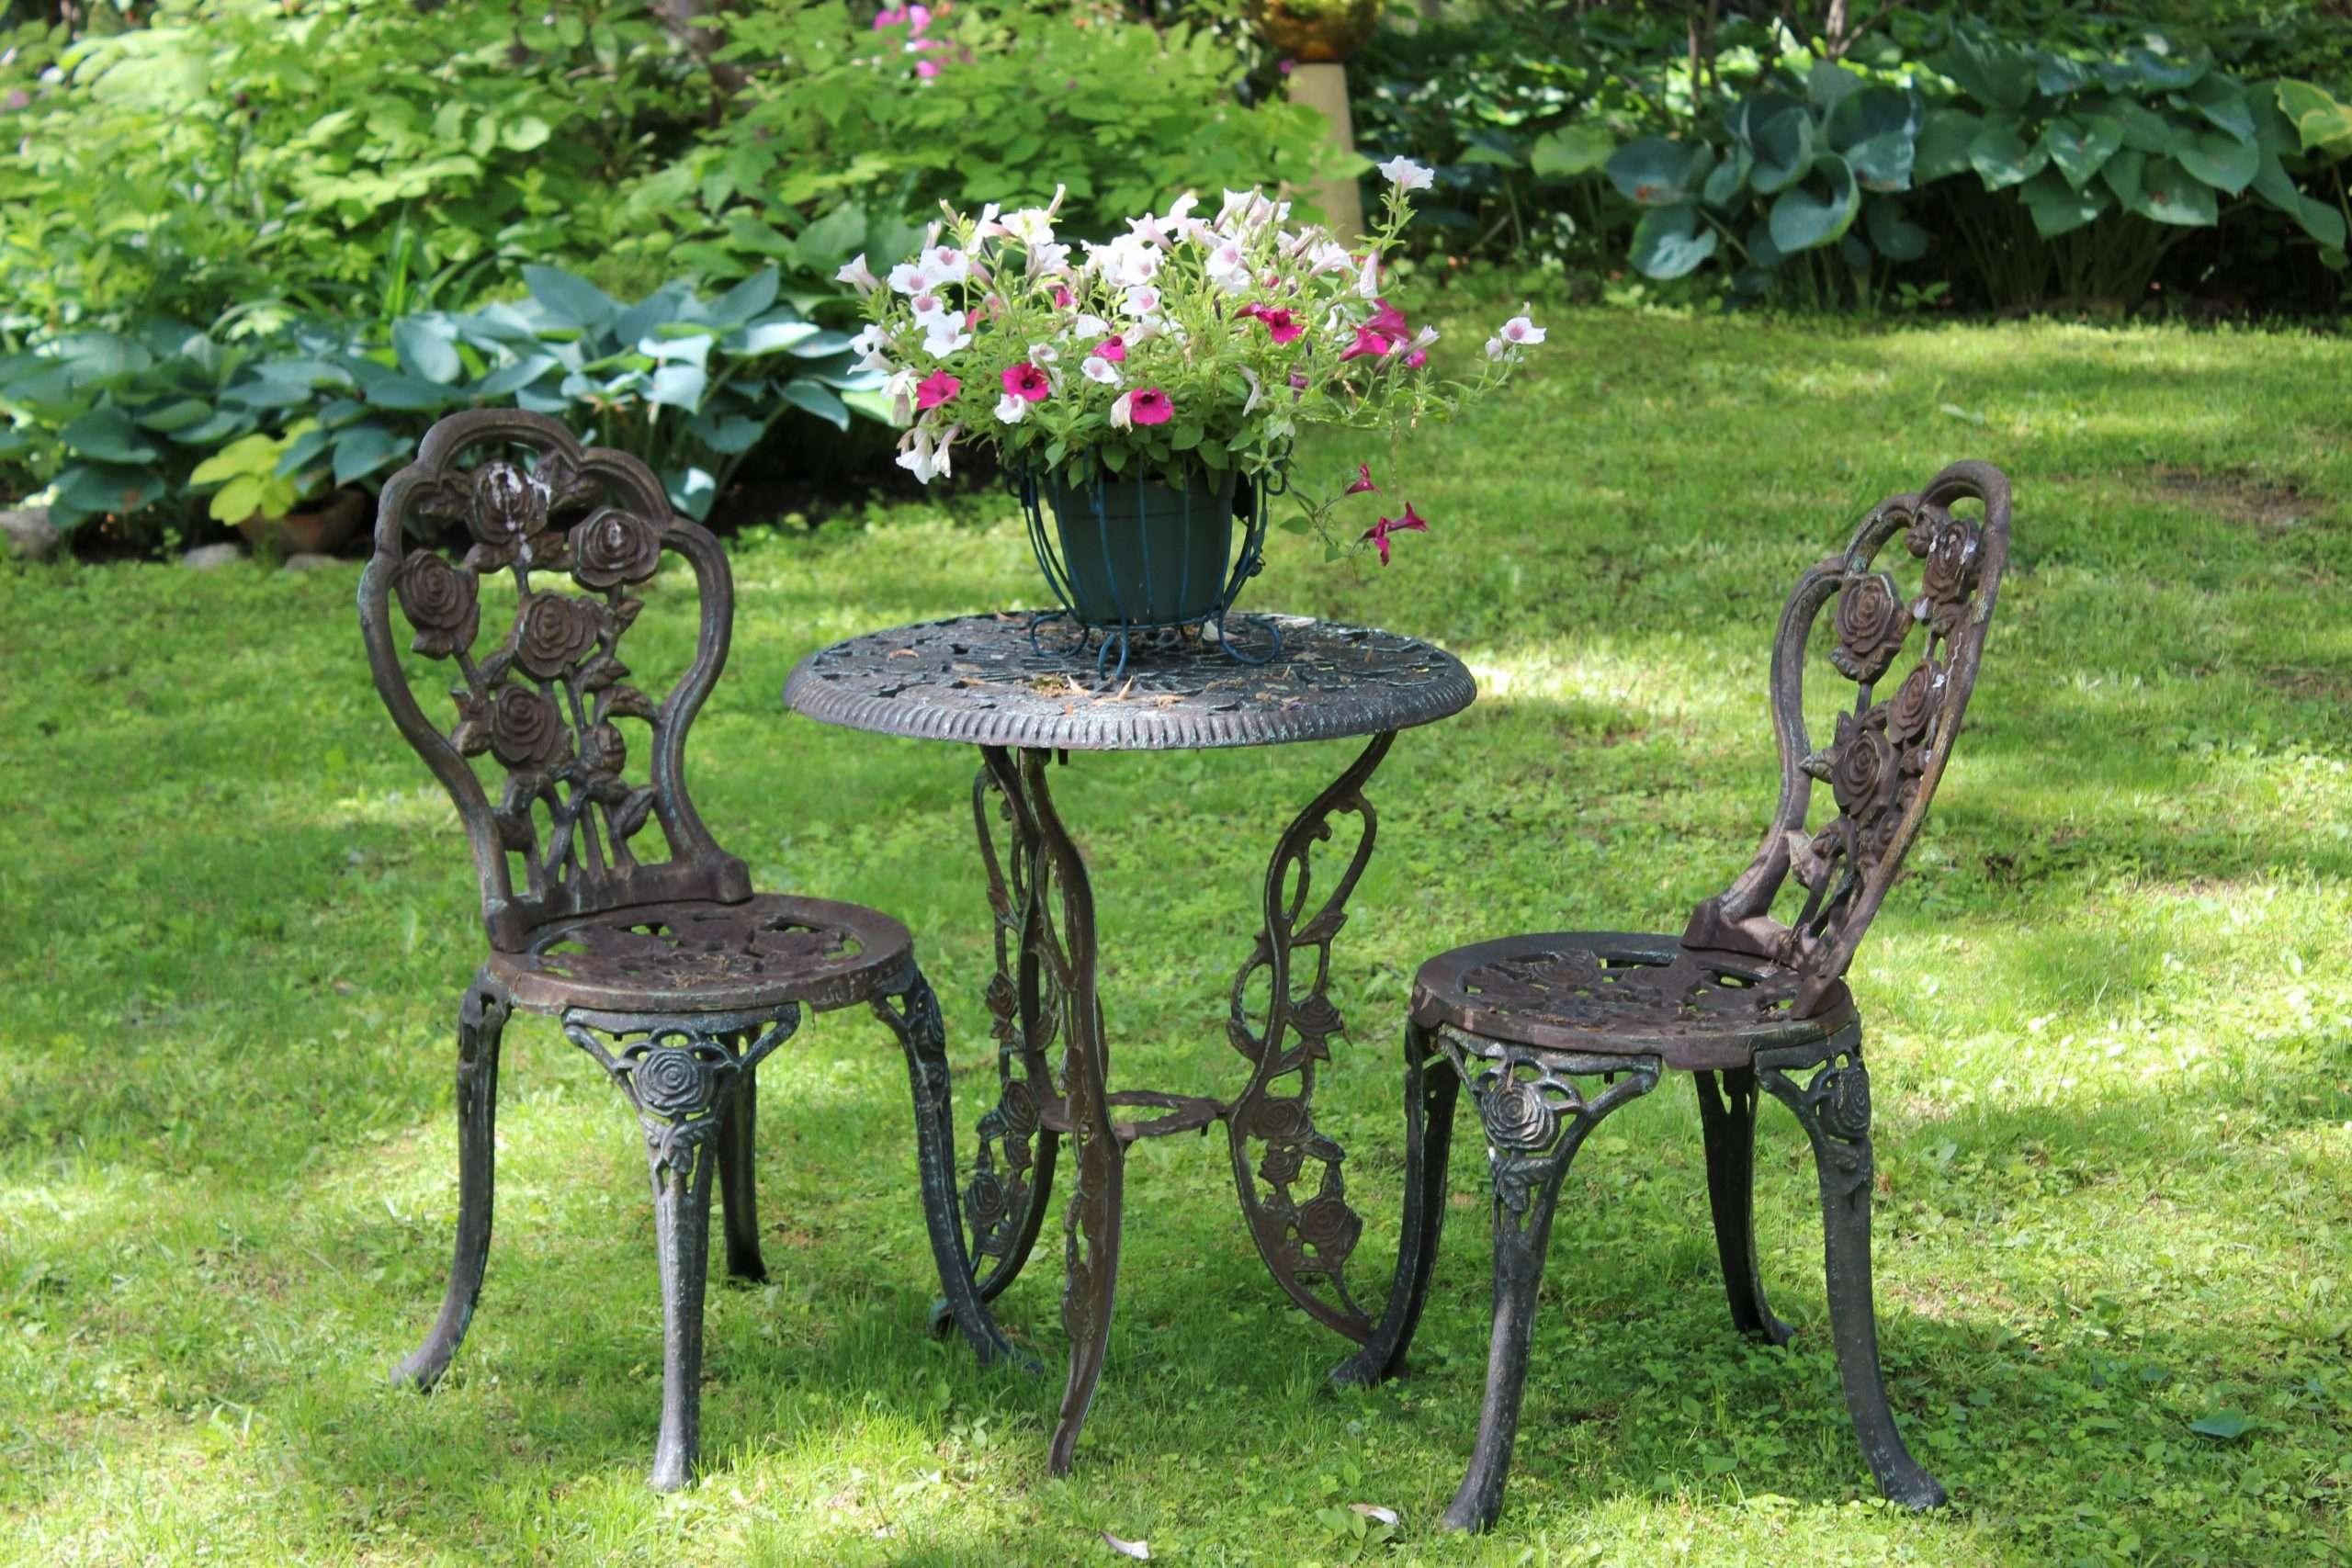 Vintage Cast Iron Patio Furniture Antique Garden Mid ...